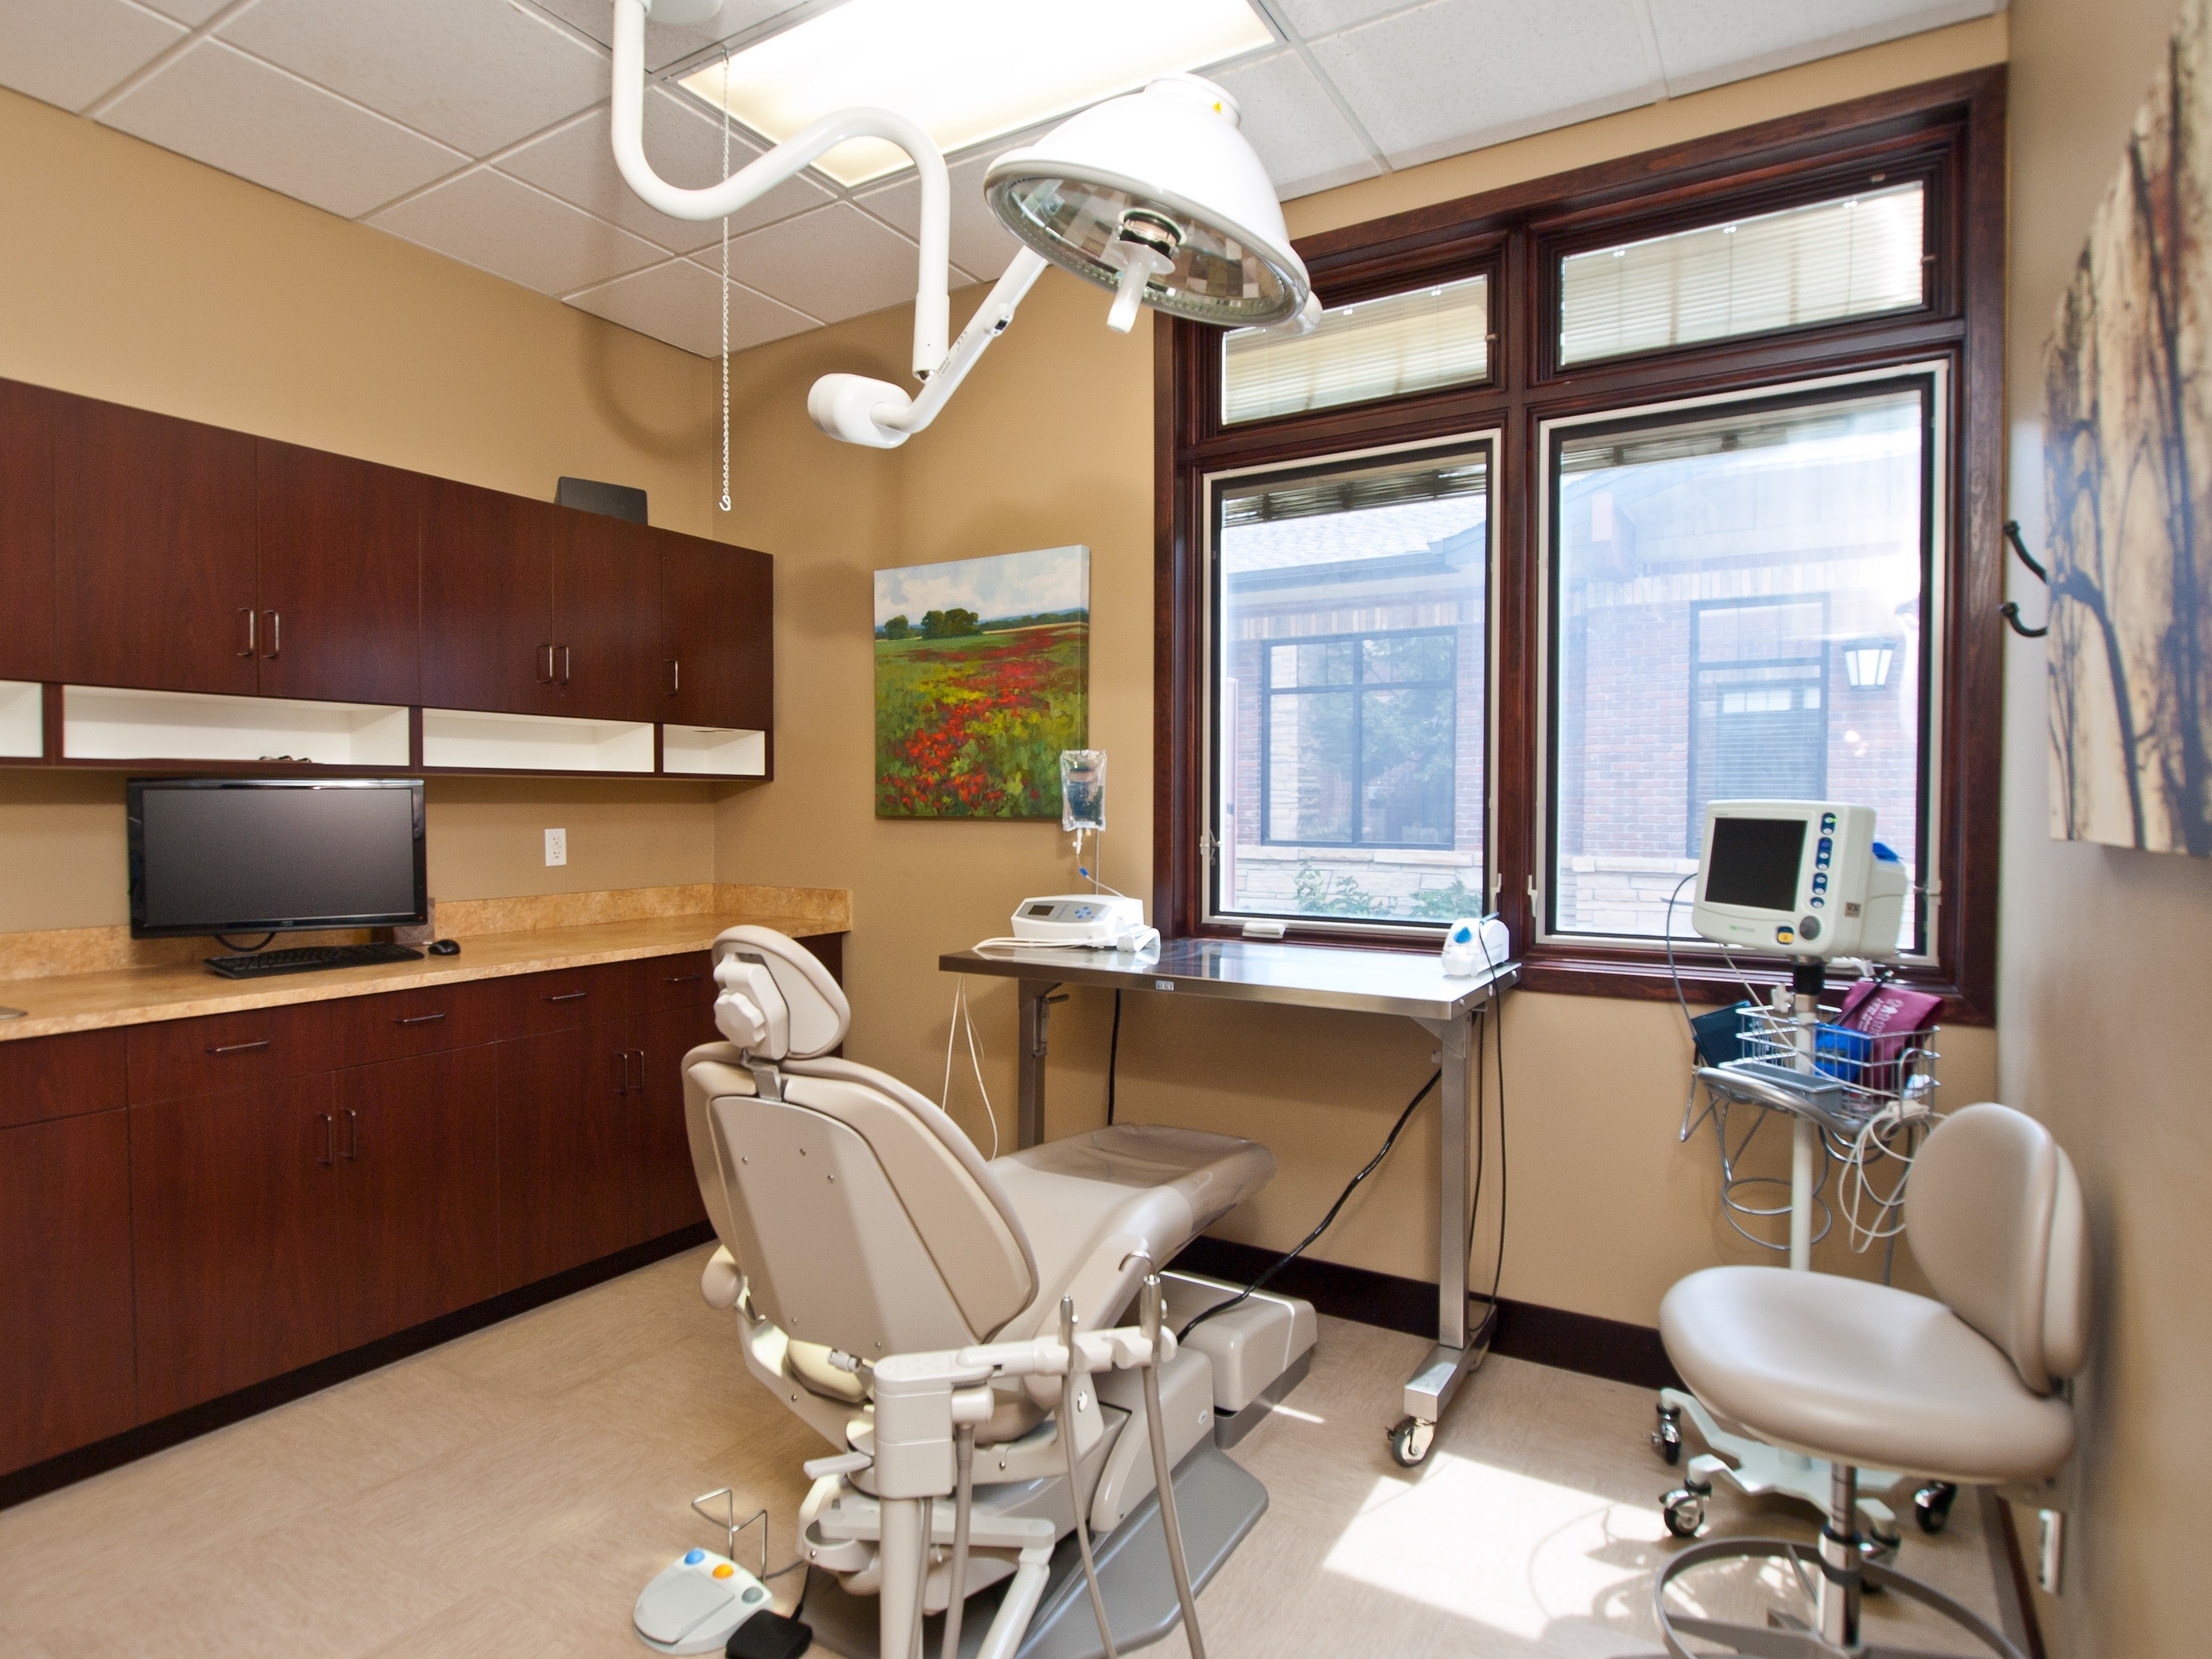 Walton Implants and Periodontics image 7